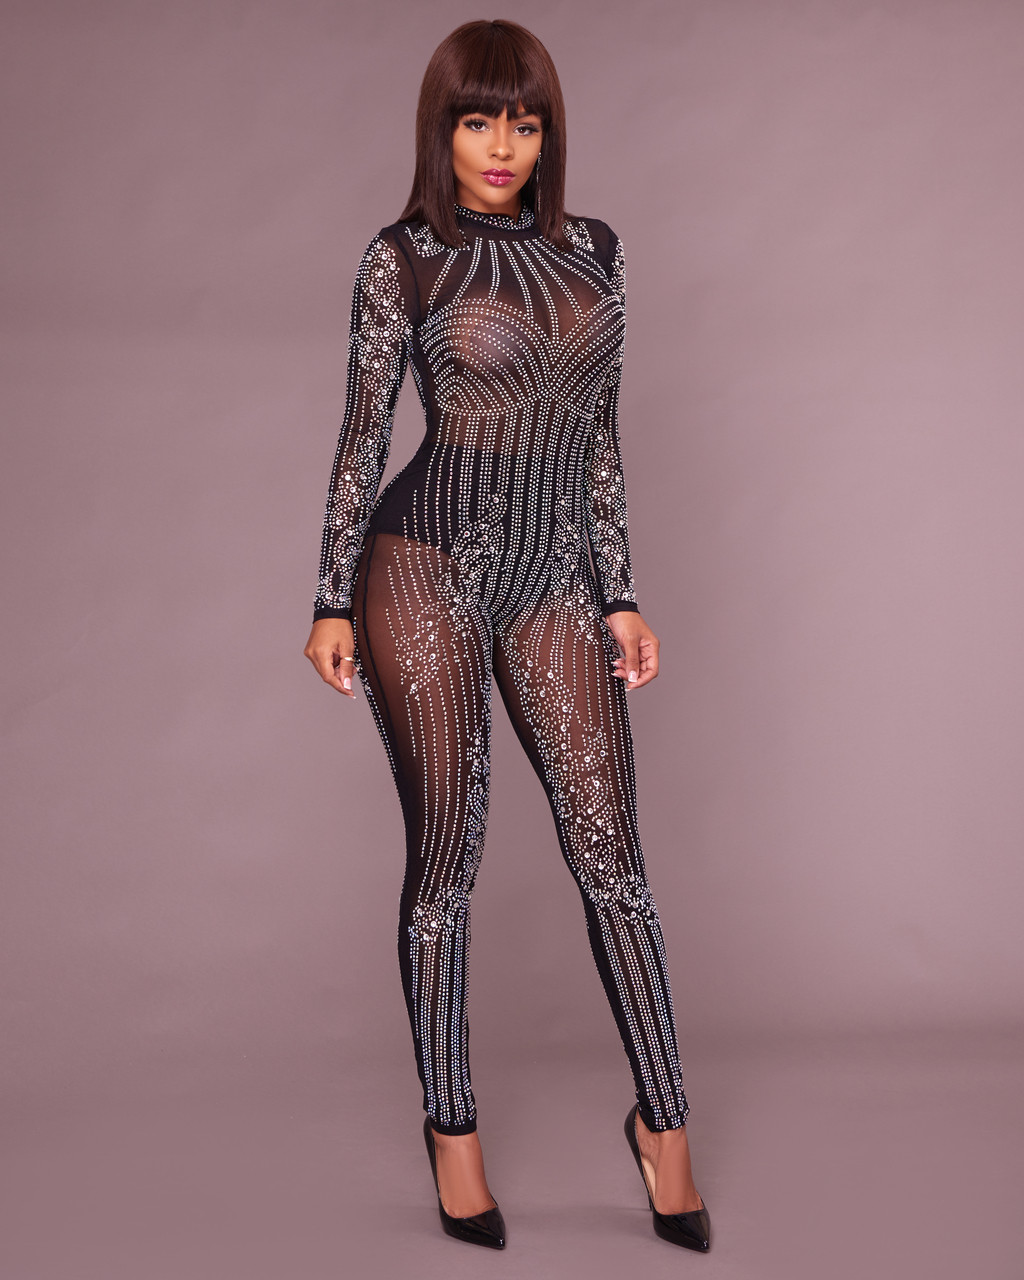 ac8e6cf5433 Yessy Black Rhinestones Semi-Sheer Jumpsuit. Price   100.00. Image 1